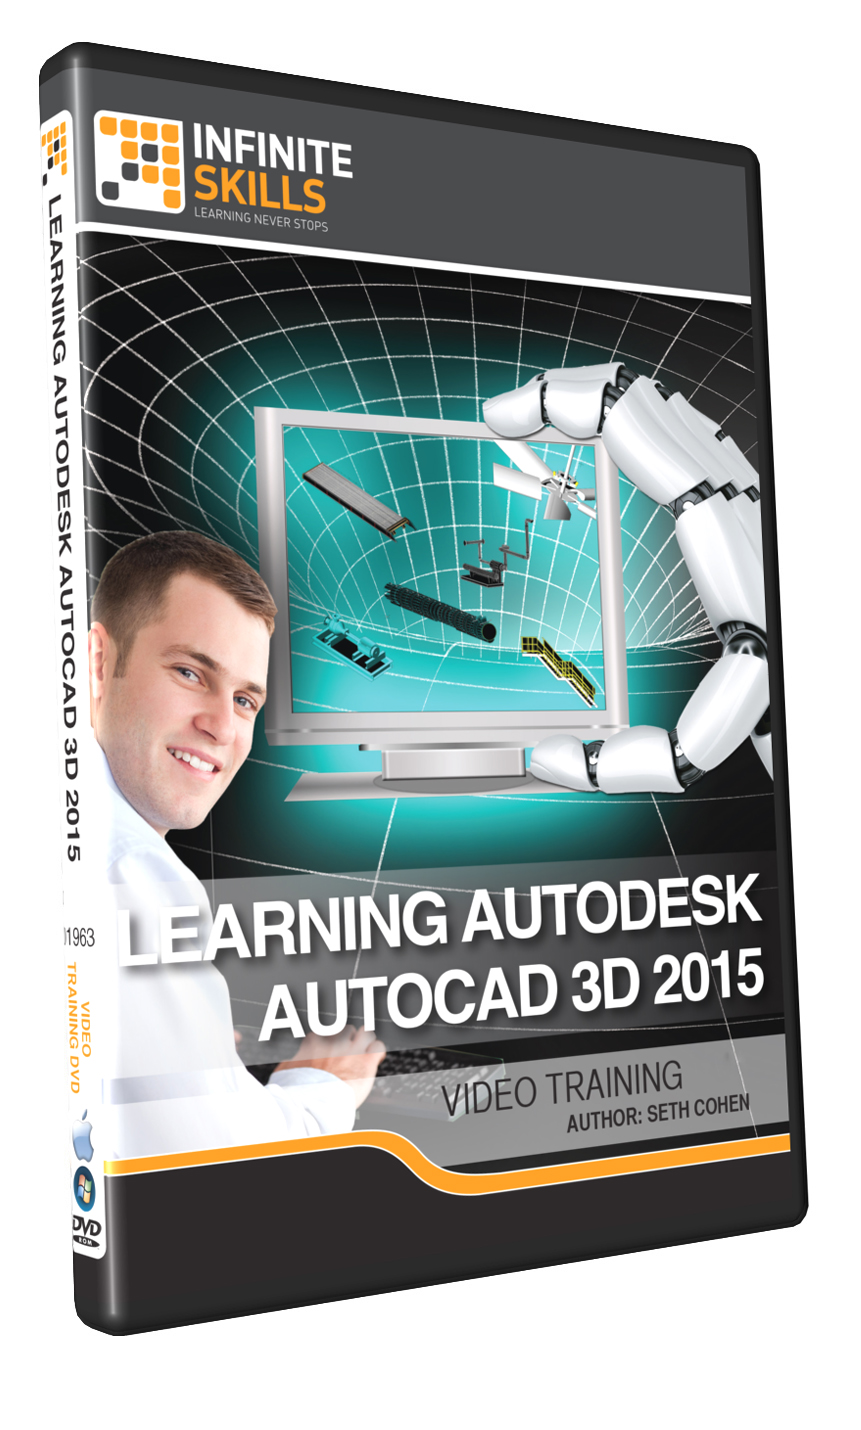 descarga Infinite Skills - Learning Autodesk AutoCAD 2014